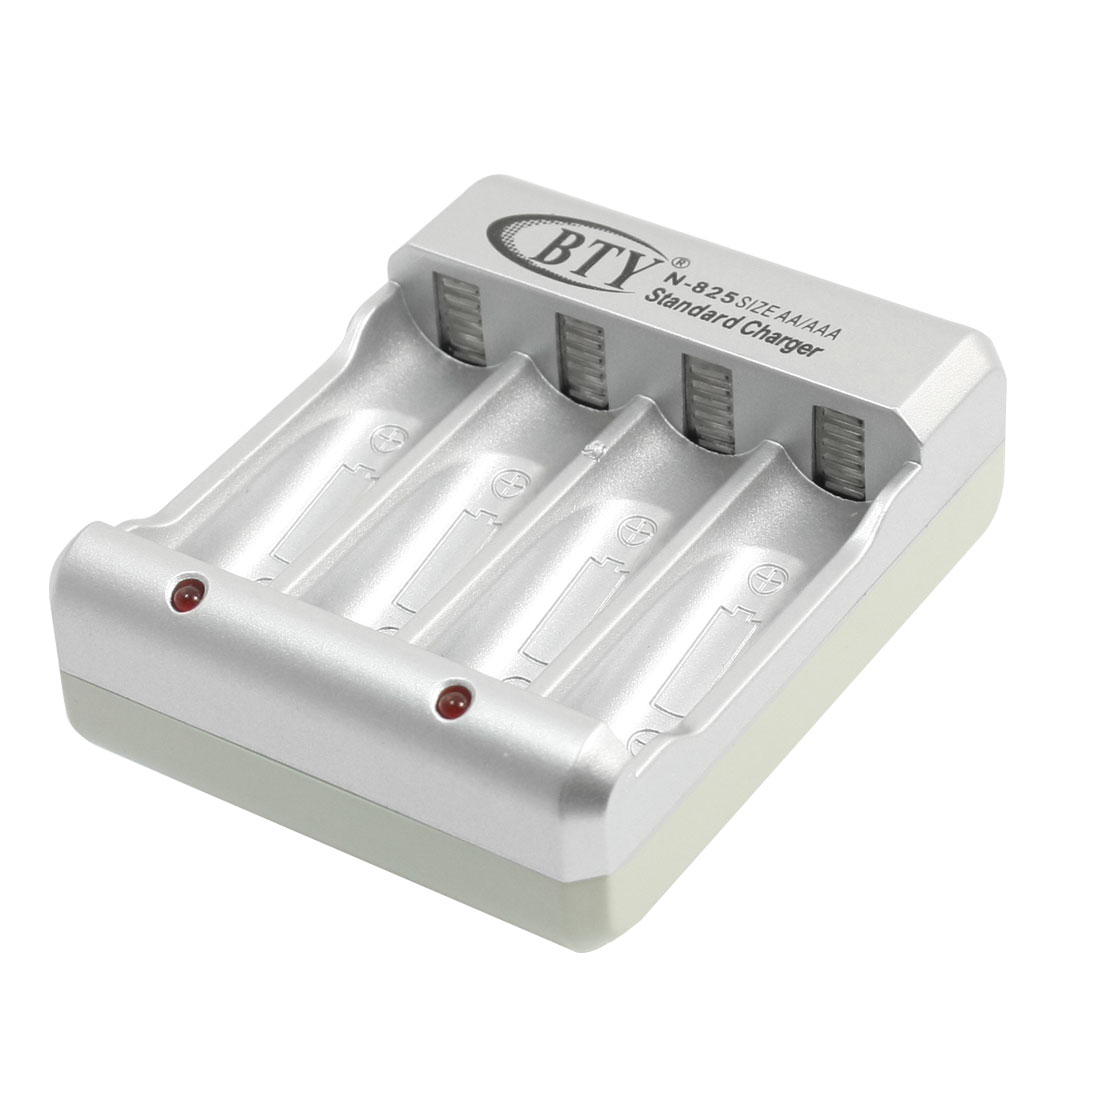 AC 100-240V EU Plug 4 x 200mA AA 4 x 150mA AAA 4 Charging Battery Charger